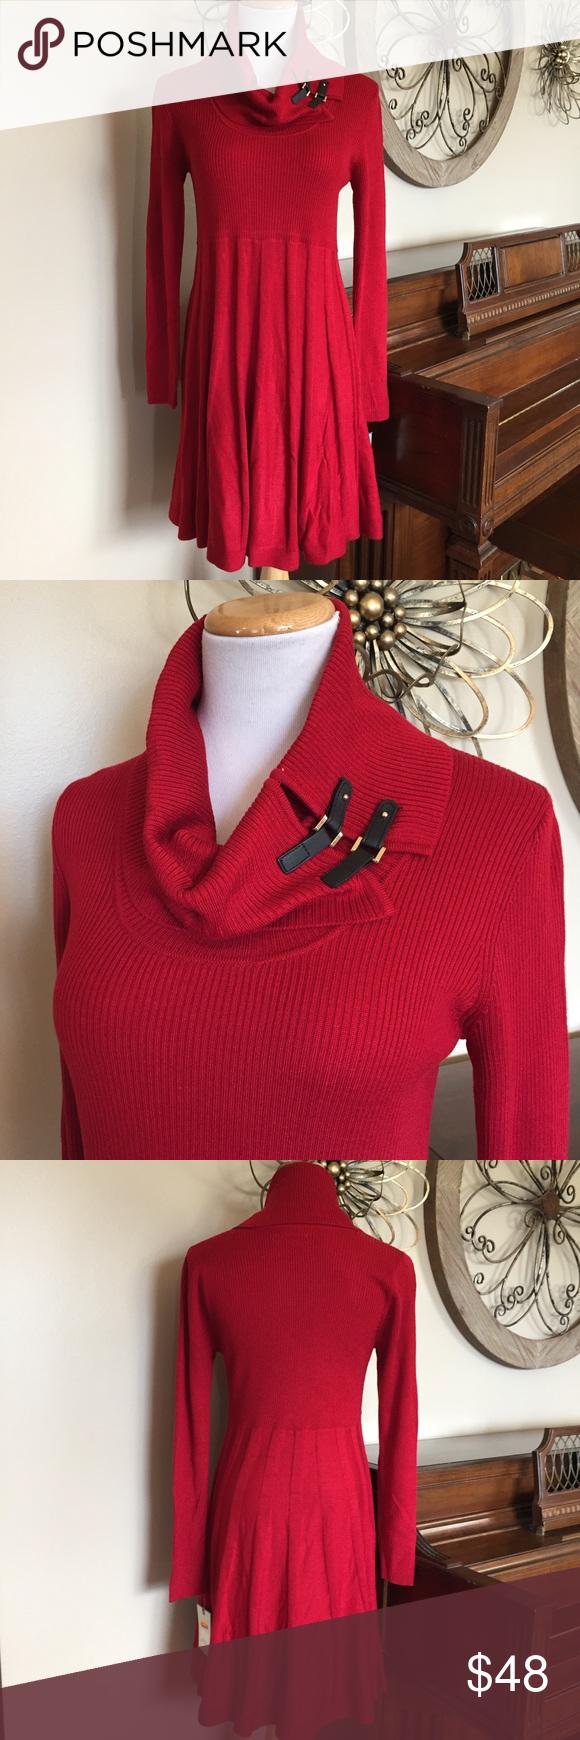 Nwt dana buchman large red cowl neck sweater dress cowl neck